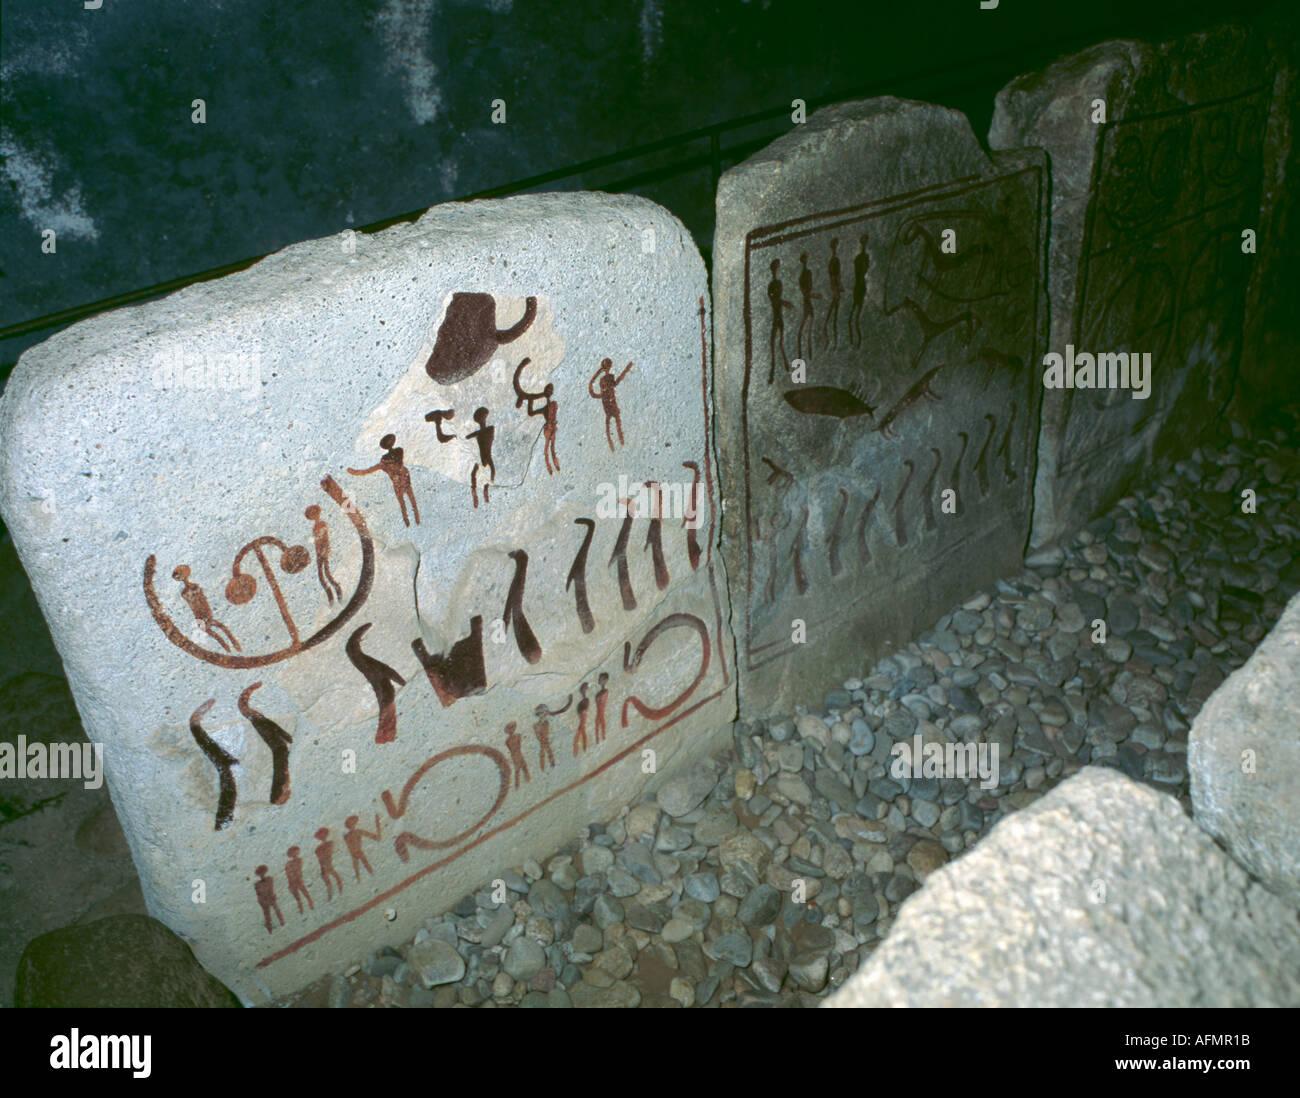 Interior of Kungagraven (King's Grave or Bredarör burial cist), Bronze Age tomb, Kivik, Skåne, Sweden. - Stock Image